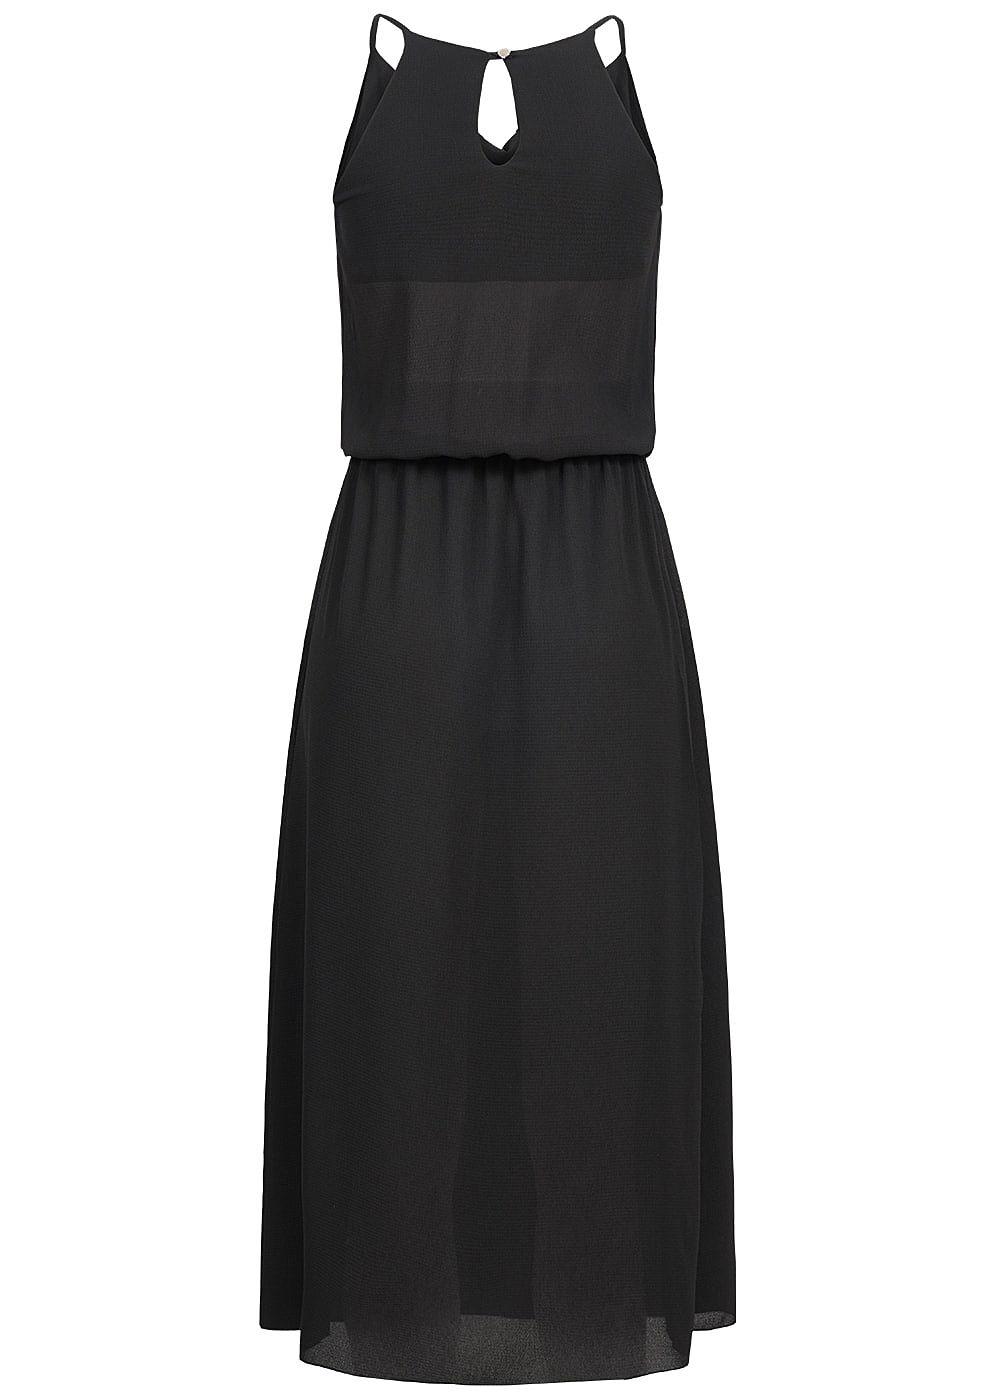 styleboom fashion damen longform kleid wasserfall look schwarz 77onlineshop. Black Bedroom Furniture Sets. Home Design Ideas